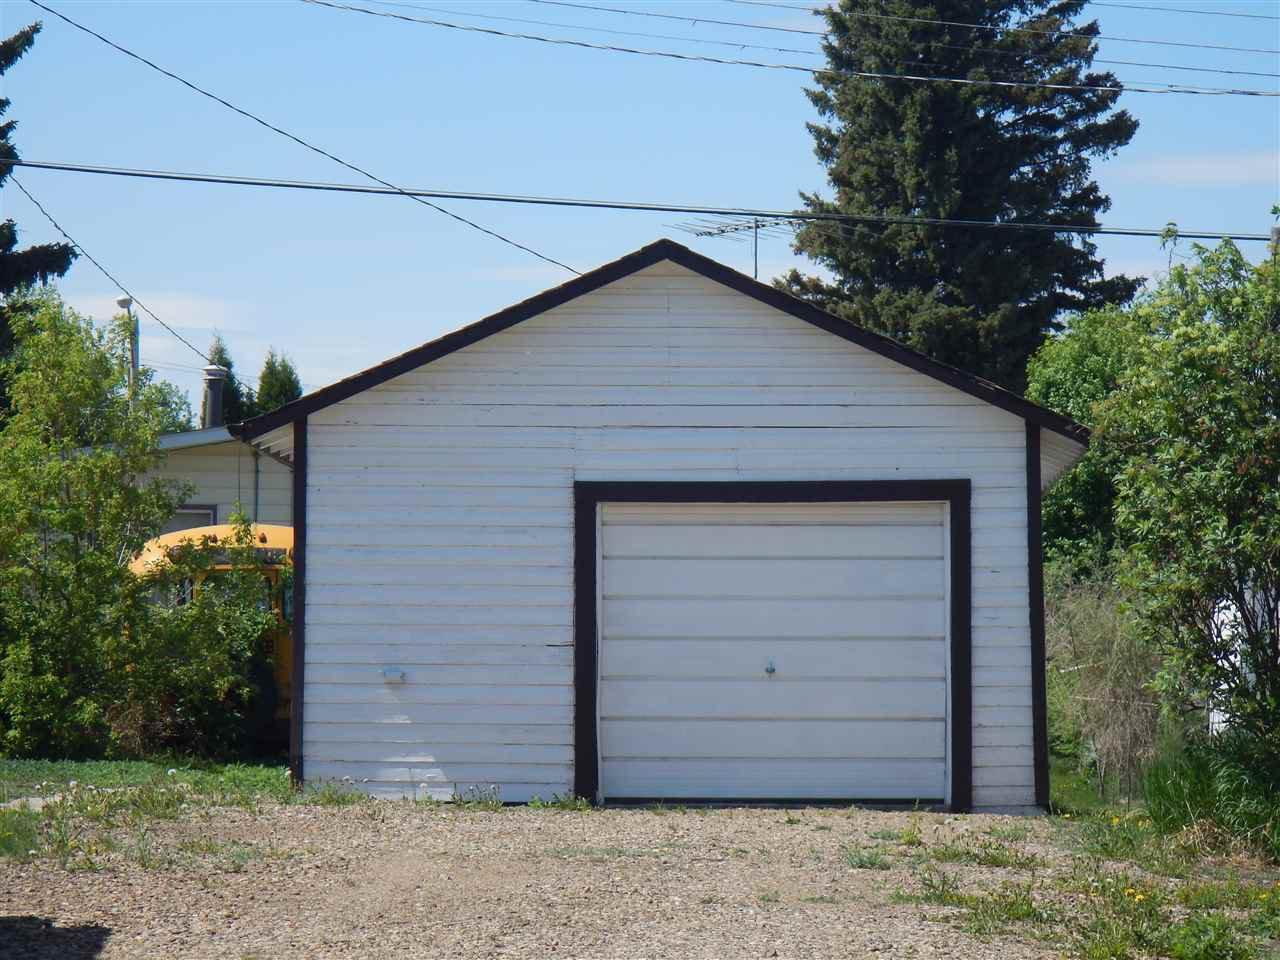 Photo 5: Photos: 5120 48 Street: Waskatenau House for sale : MLS®# E4201146